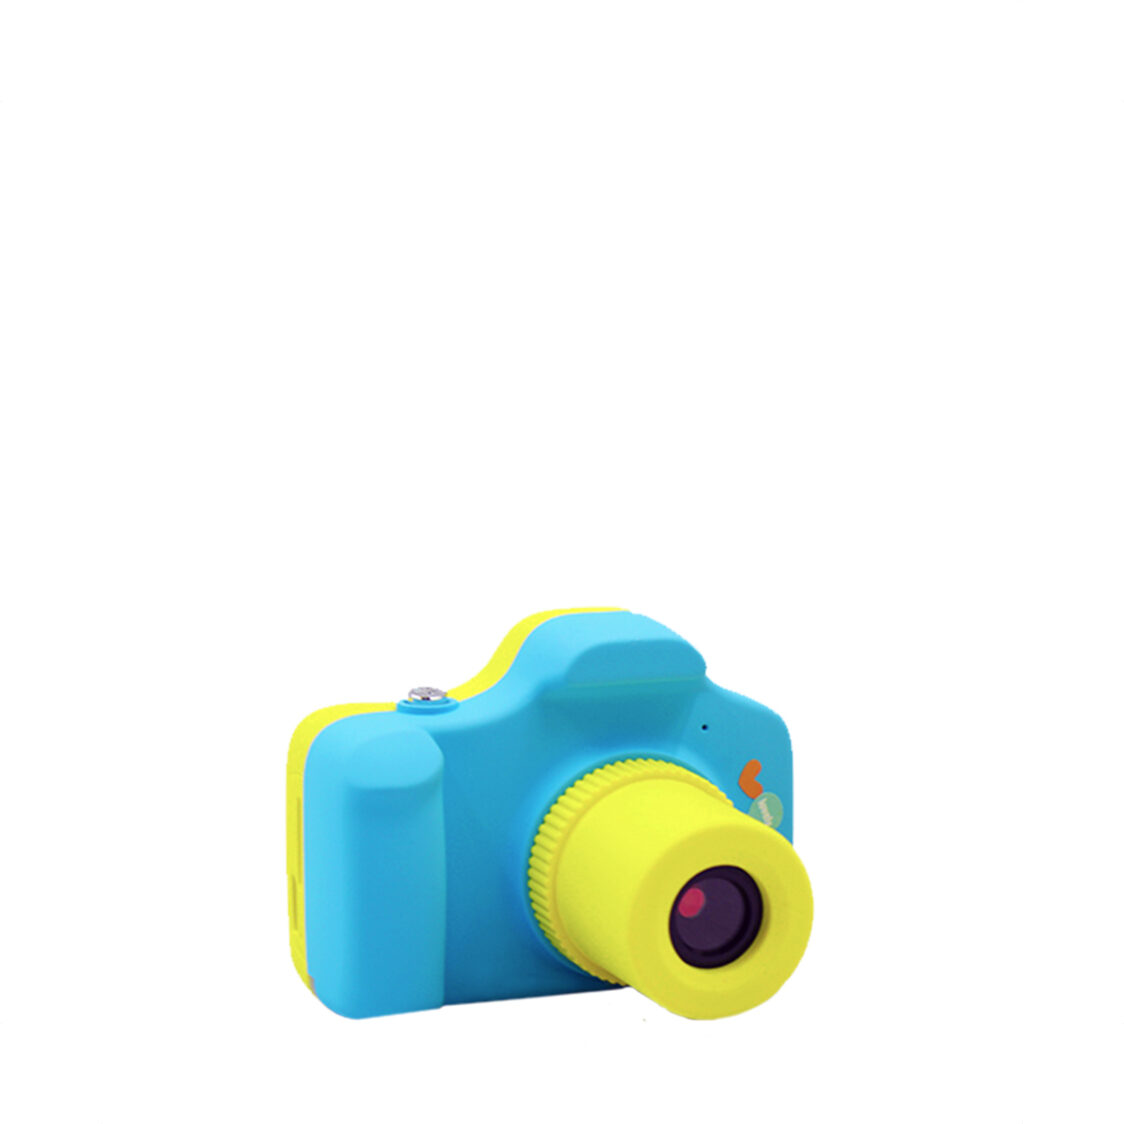 myFirst Camera 5MP Photo  Video